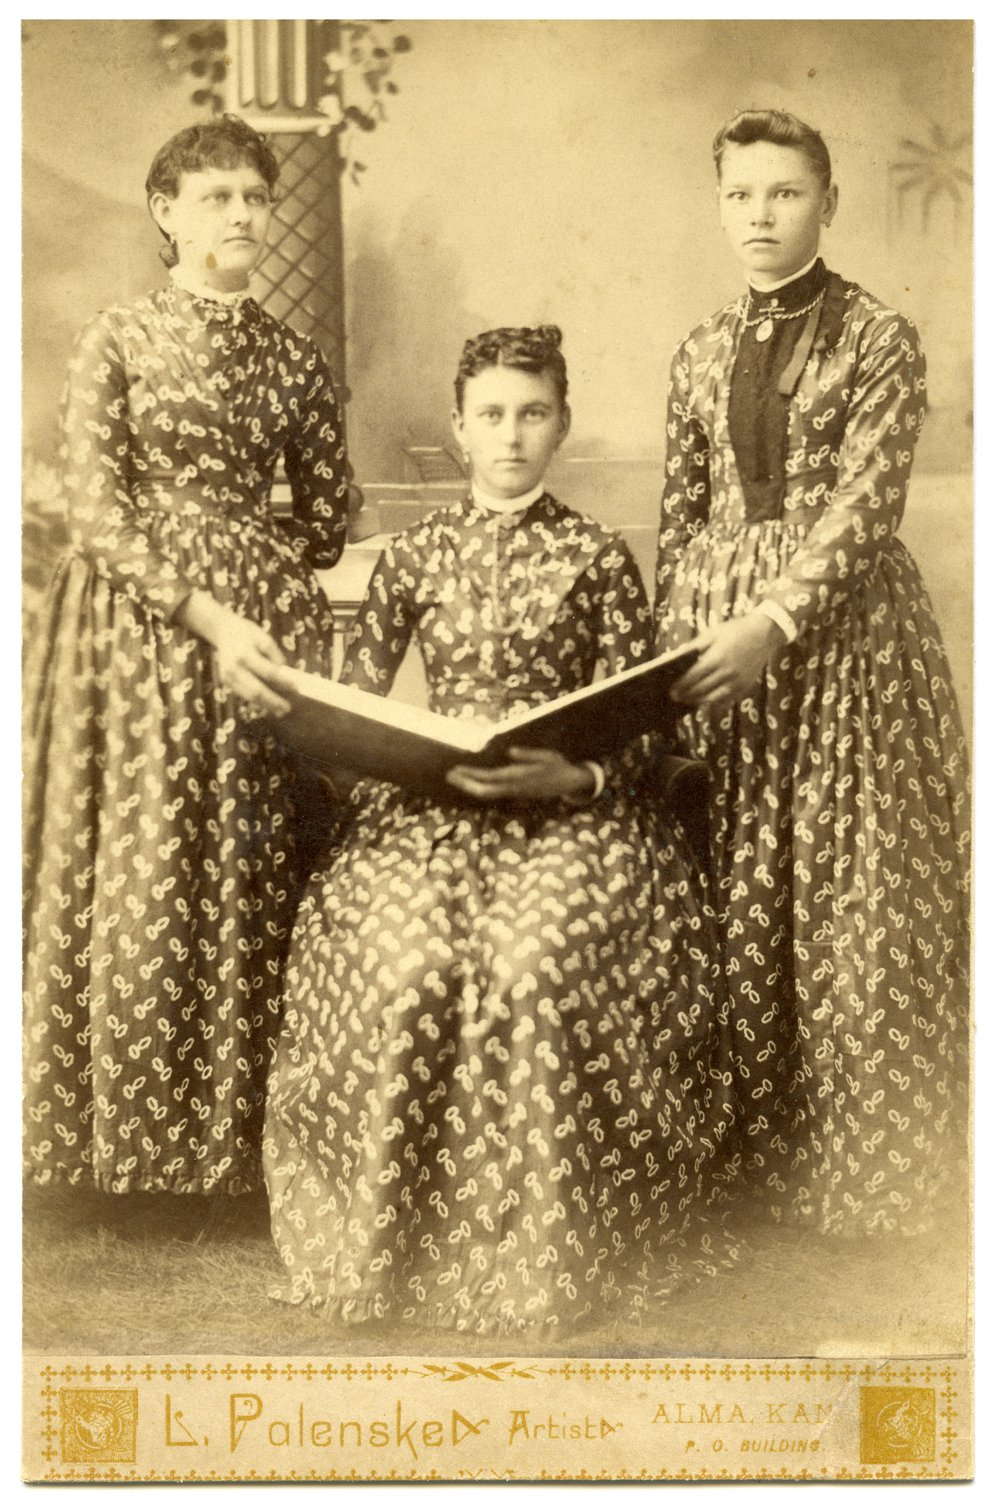 Three unidentified women in Alma, Kansas - 1